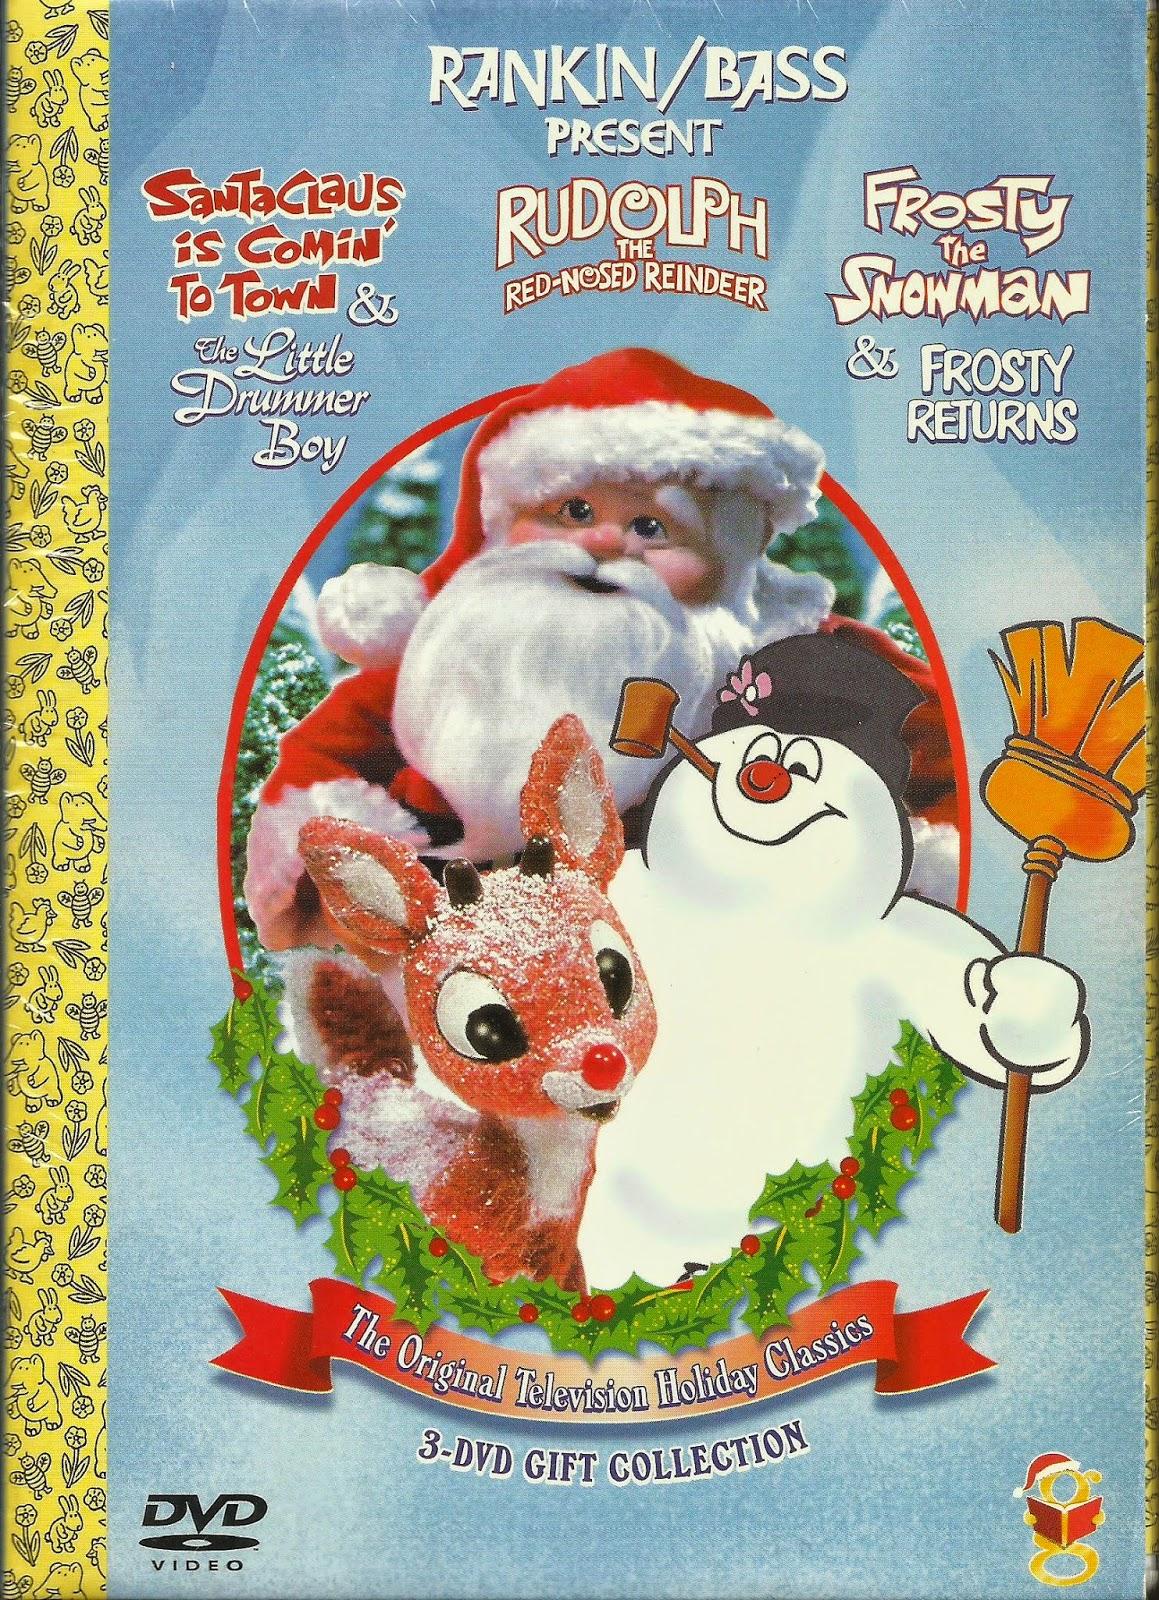 Rankin Bass Historian Rankin Bass Rudolph The Red Nosed Reindeer 50th Anniversary Blu Ray And Dvd,Ina Garten Beef Tenderloin Mustard Sauce